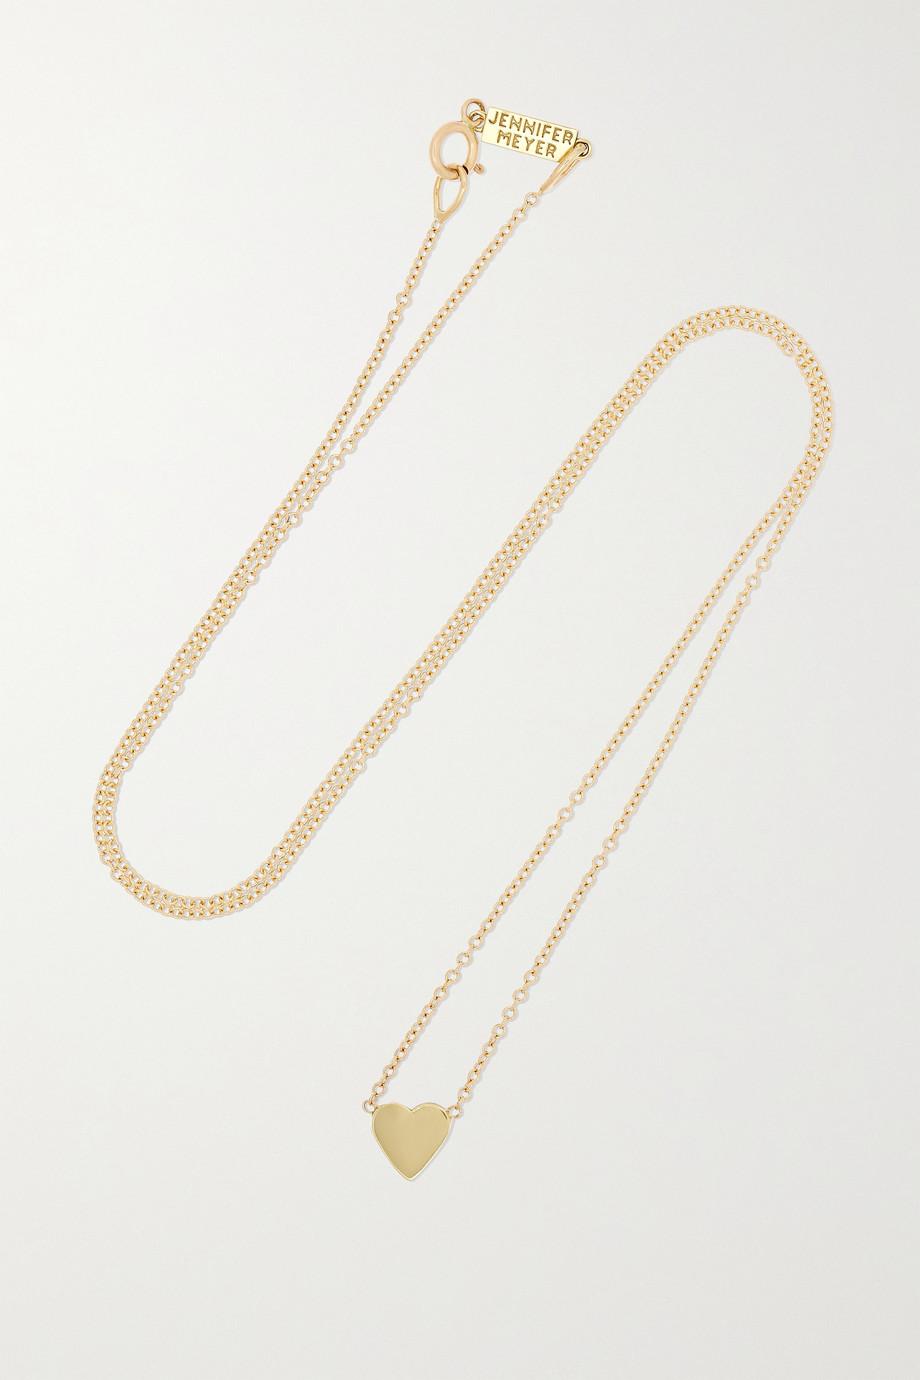 Jennifer Meyer Mini Heart 18-karat gold necklace